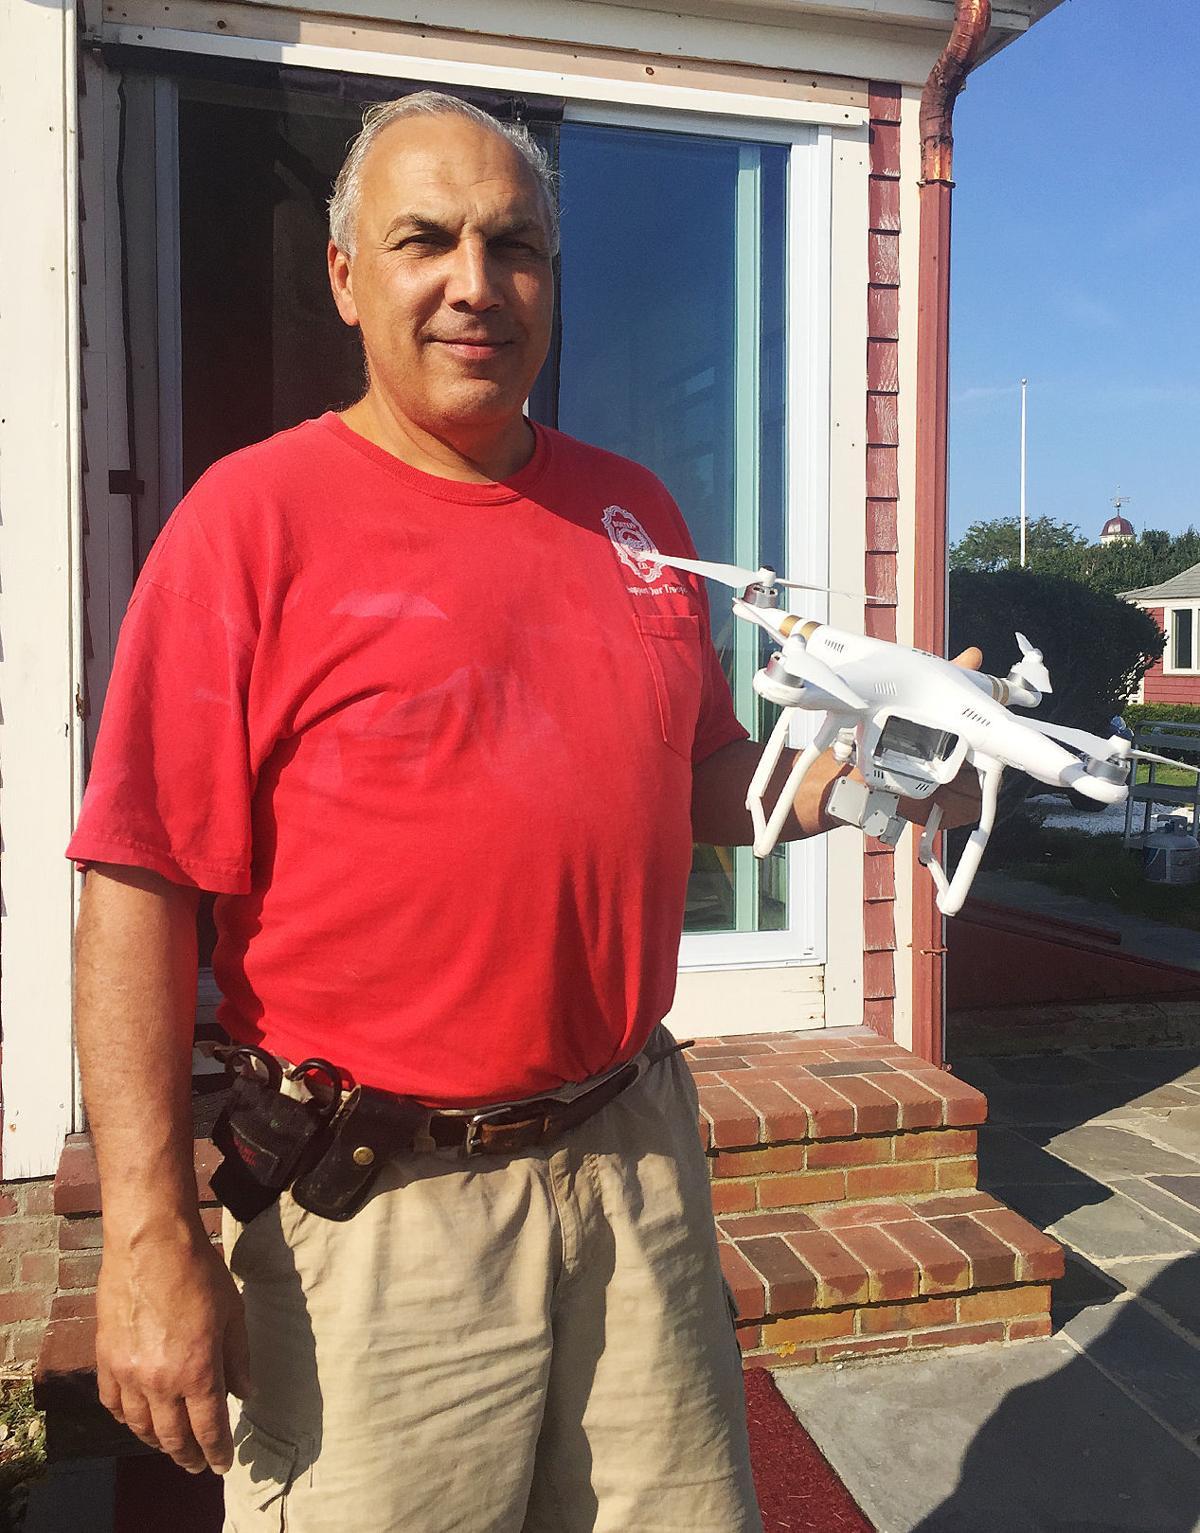 Drone Crash - September 11, 2017